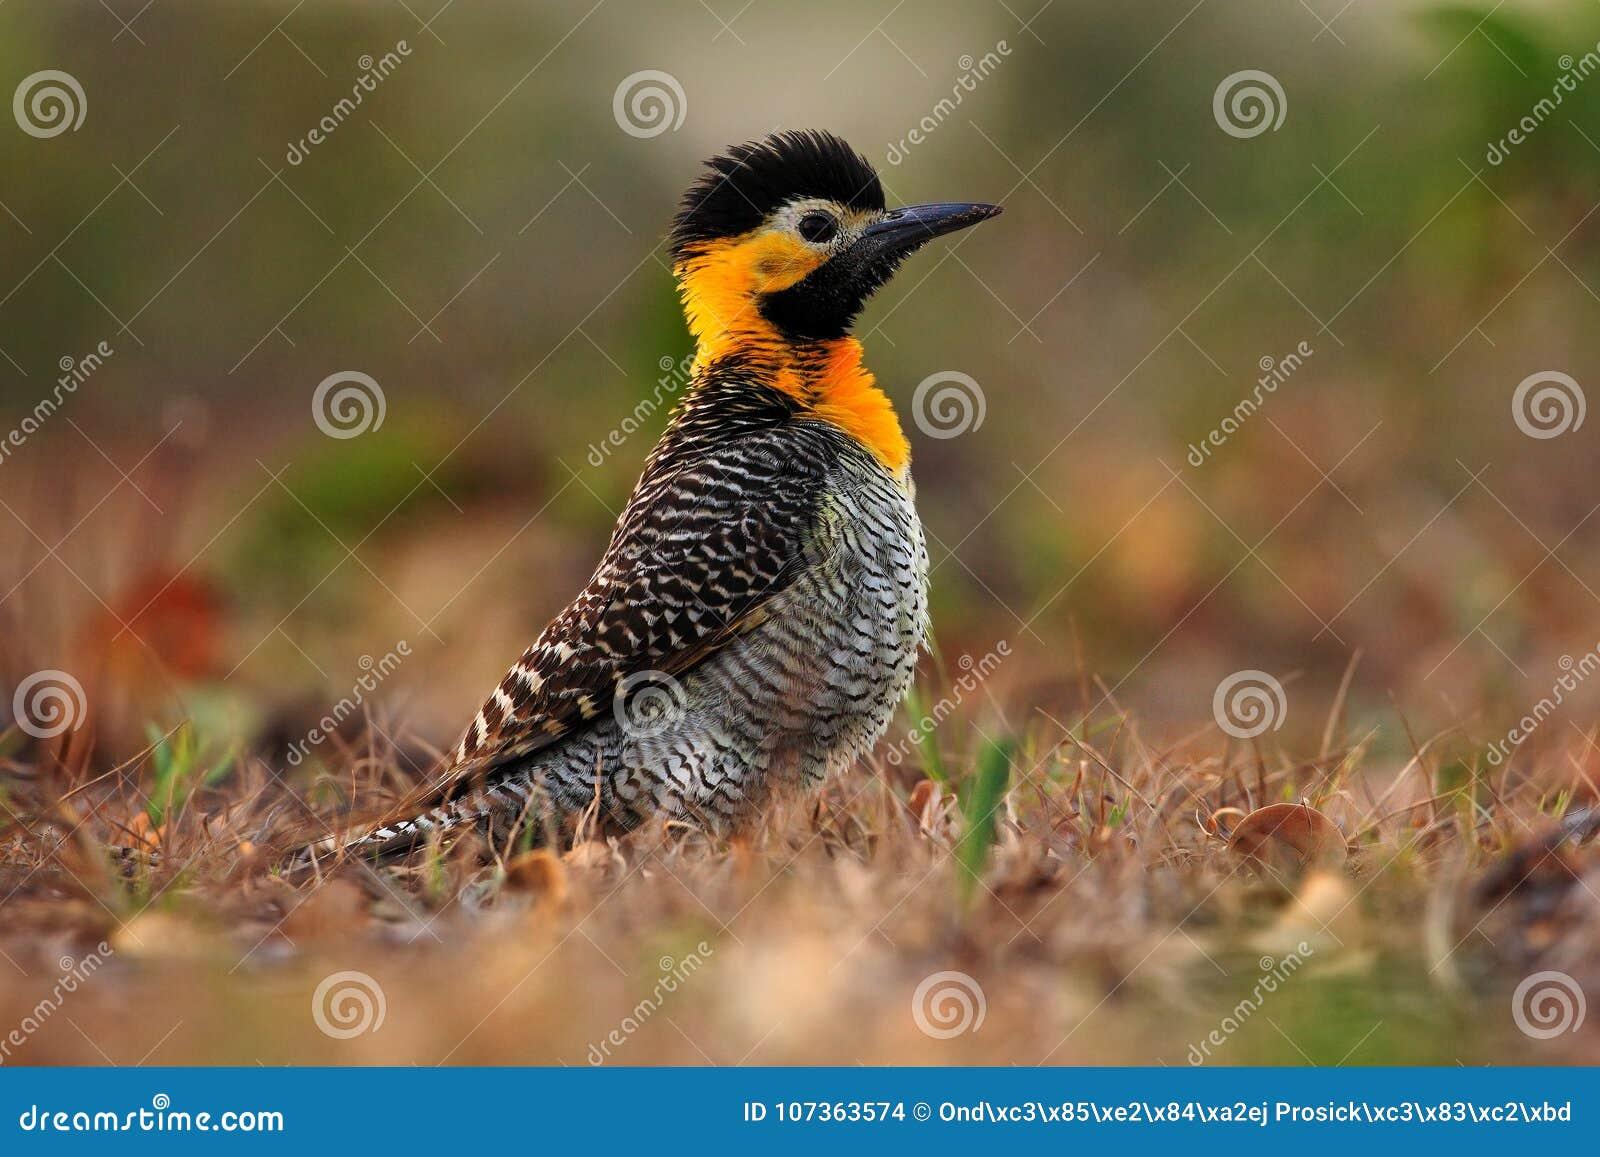 Campo τρεμούλιασμα, campestris Colaptes, εξωτικός δρυοκολάπτης στο βιότοπο φύσης, συνεδρίαση πουλιών στο κίτρινου και μαύρου κεφά